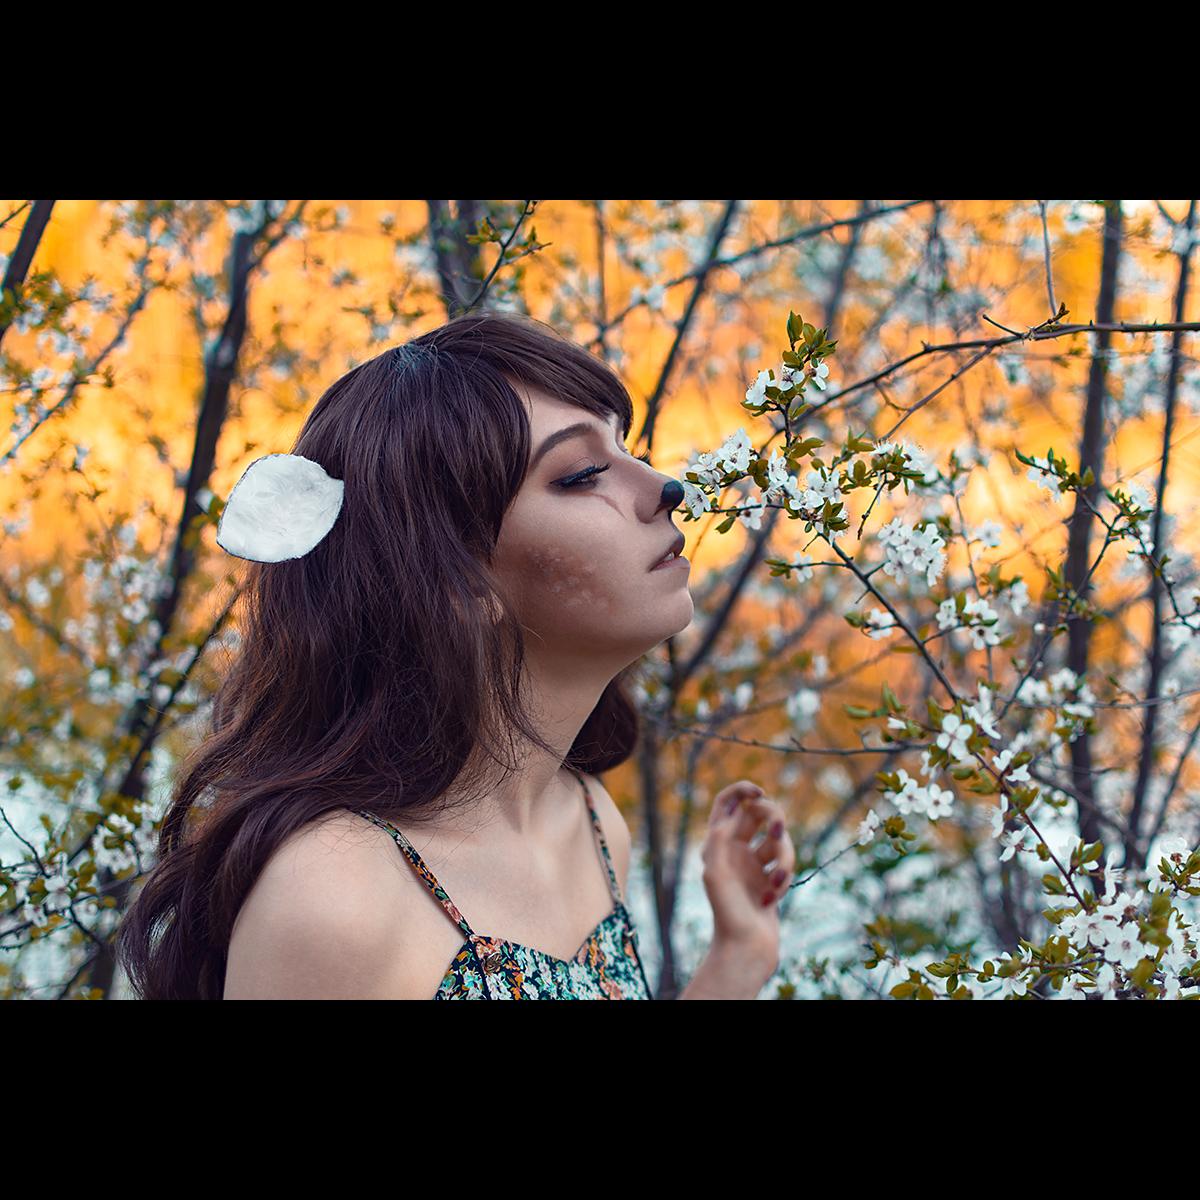 Łukasz Liszko - fotografia cosplay - Natalia Nowicka - Bambi